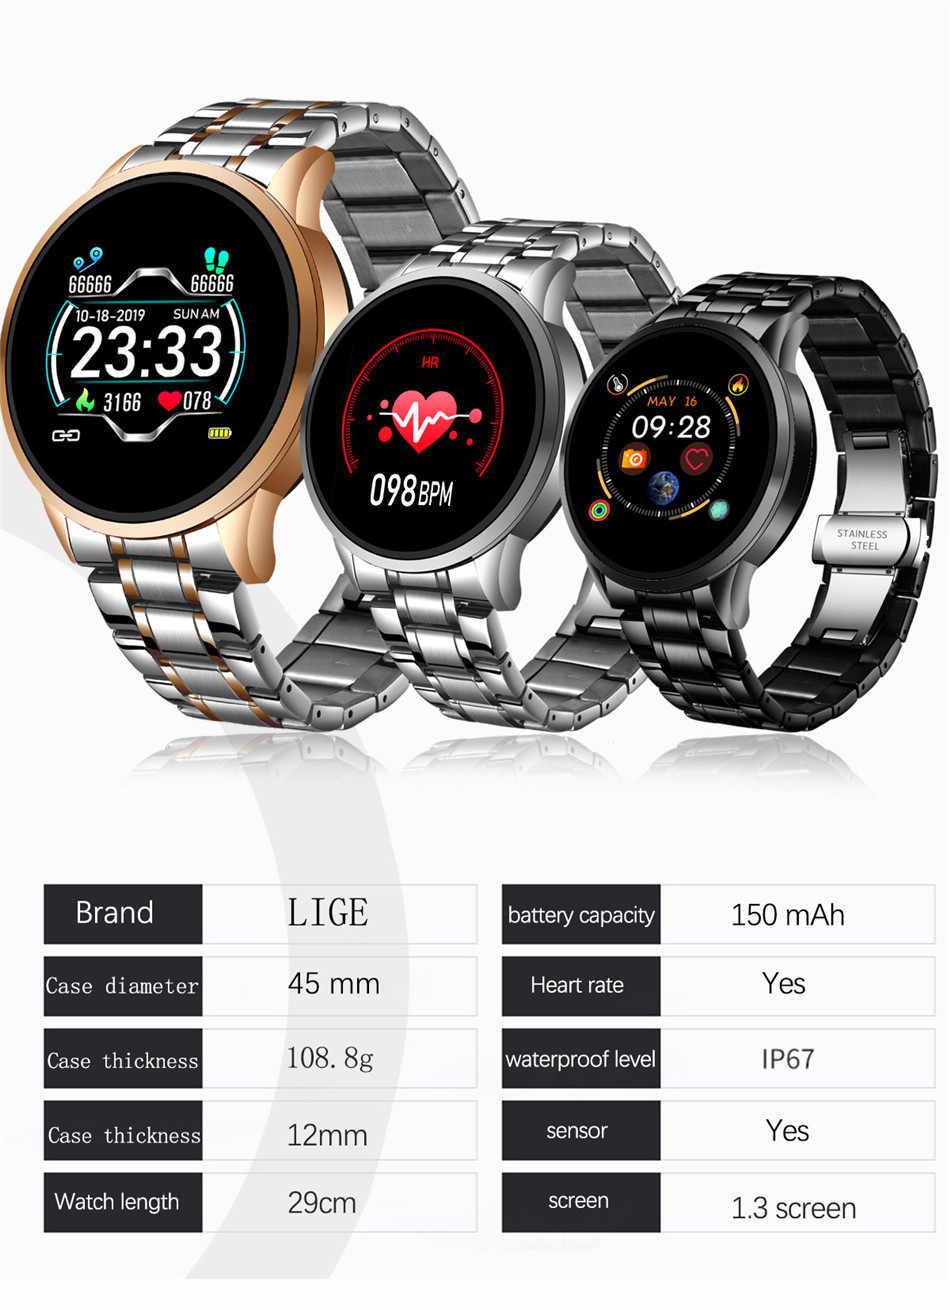 LIGE 2020 جديد ساعة ذكية الرجال النساء ساعة رياضية شاشة LED مقاوم للماء جهاز تعقب للياقة البدنية ل أندرويد ios عداد الخطى ساعة ذكية